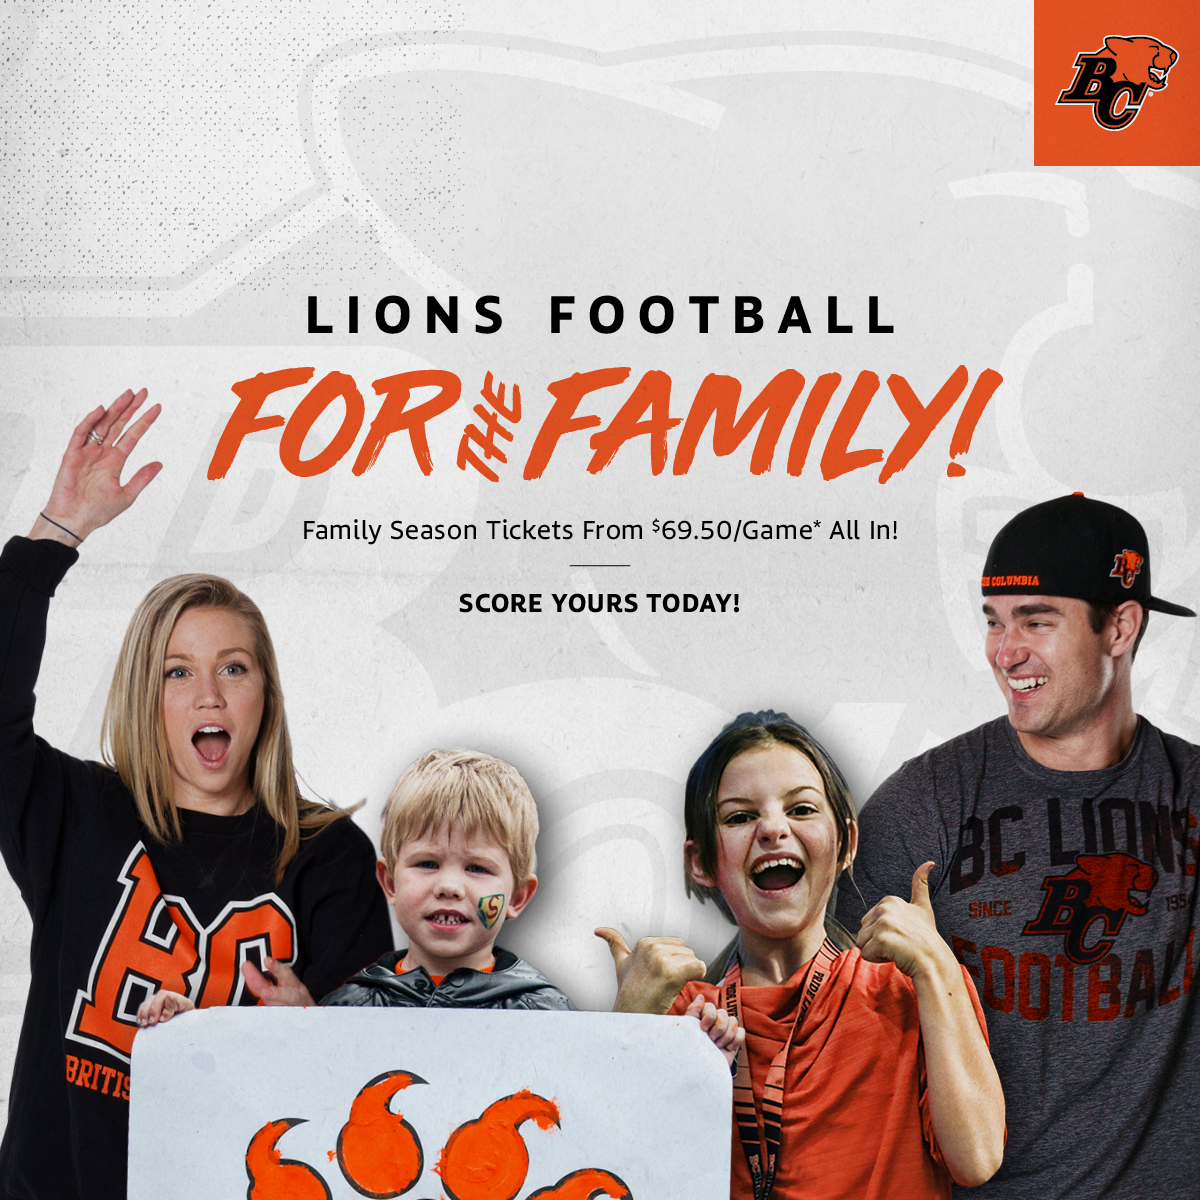 BC LIONS @BCLions